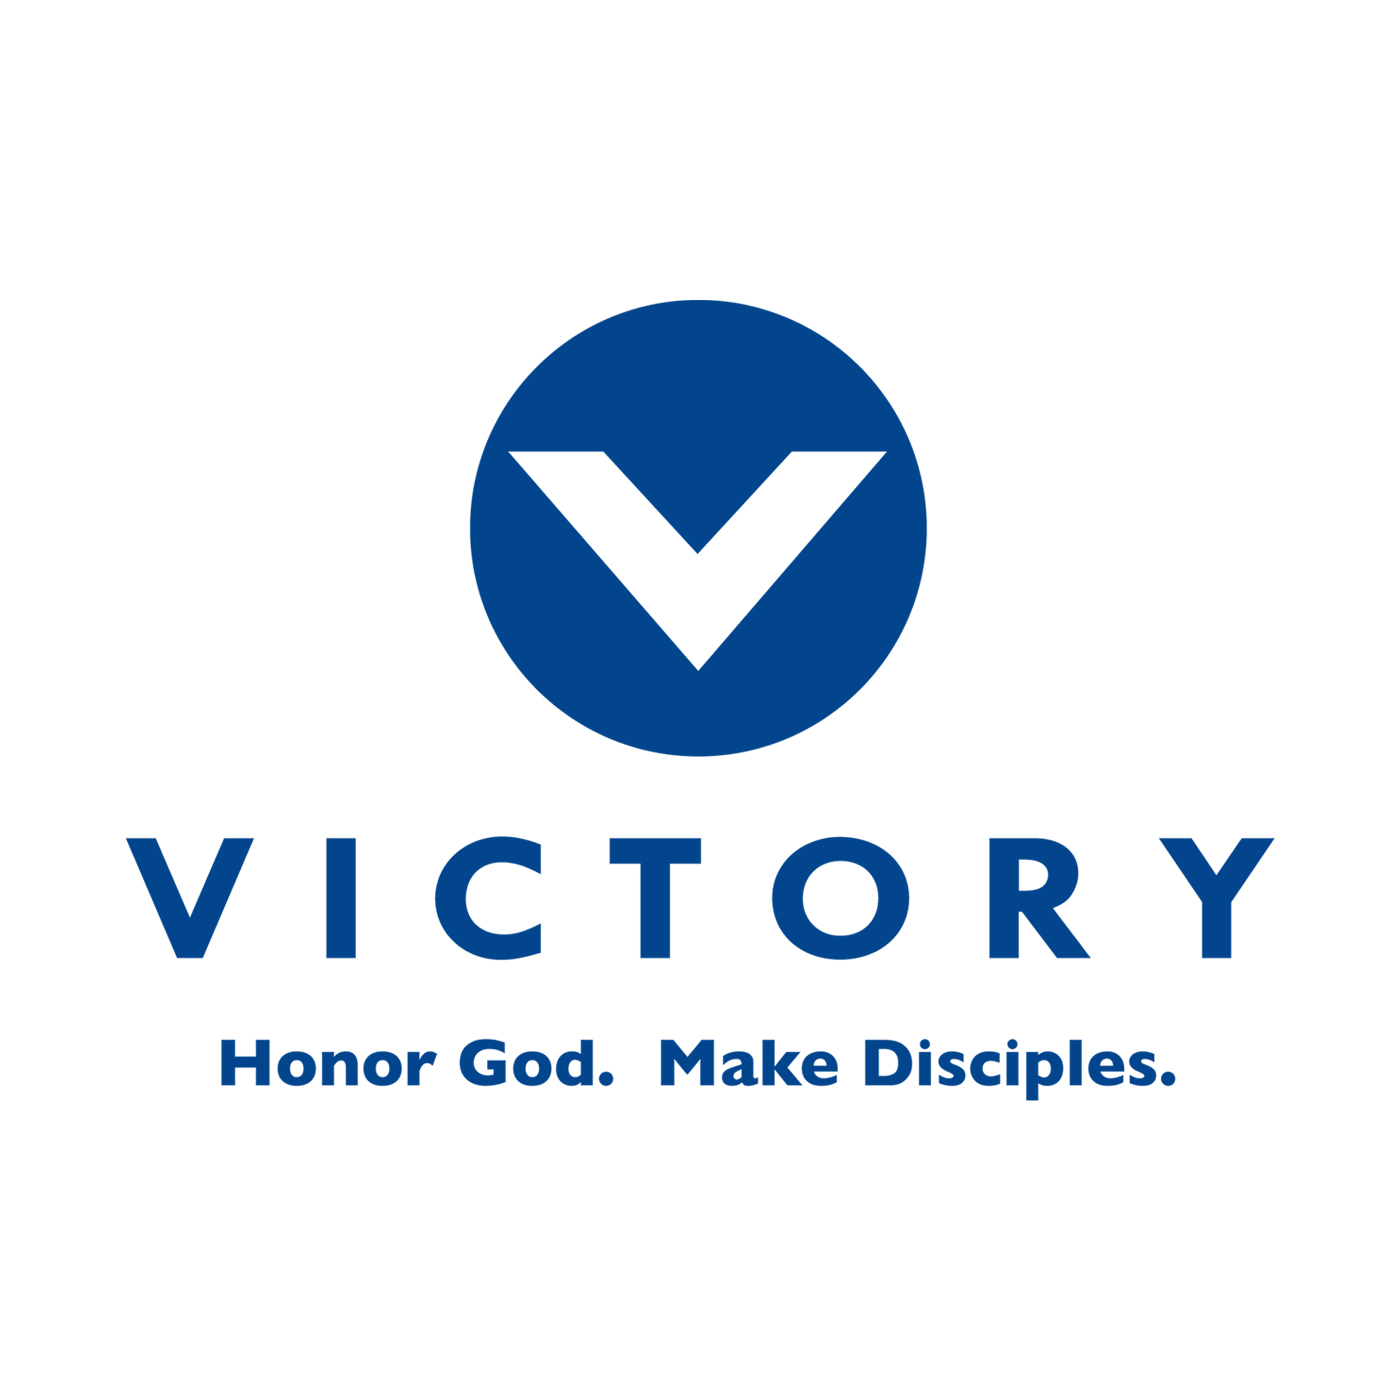 Victory logo1400g malvernweather Choice Image